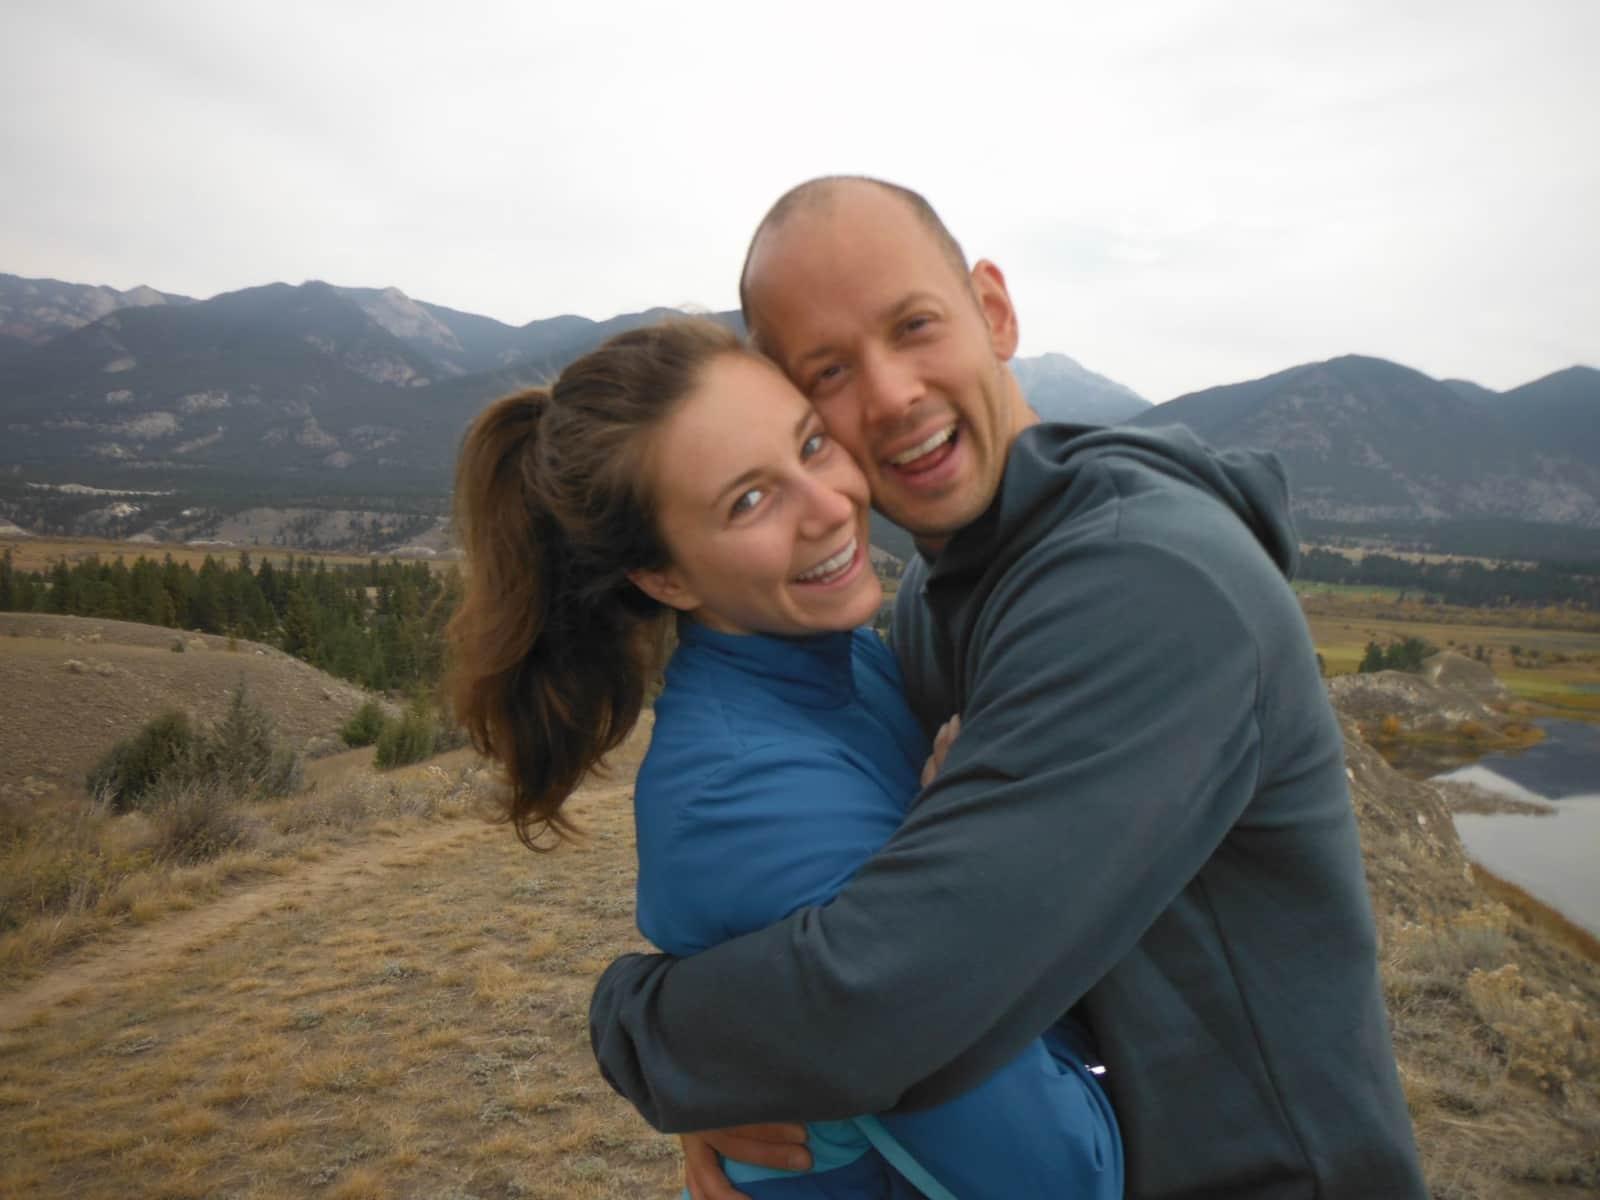 Corey & nicole & Nicole from Victoria, British Columbia, Canada